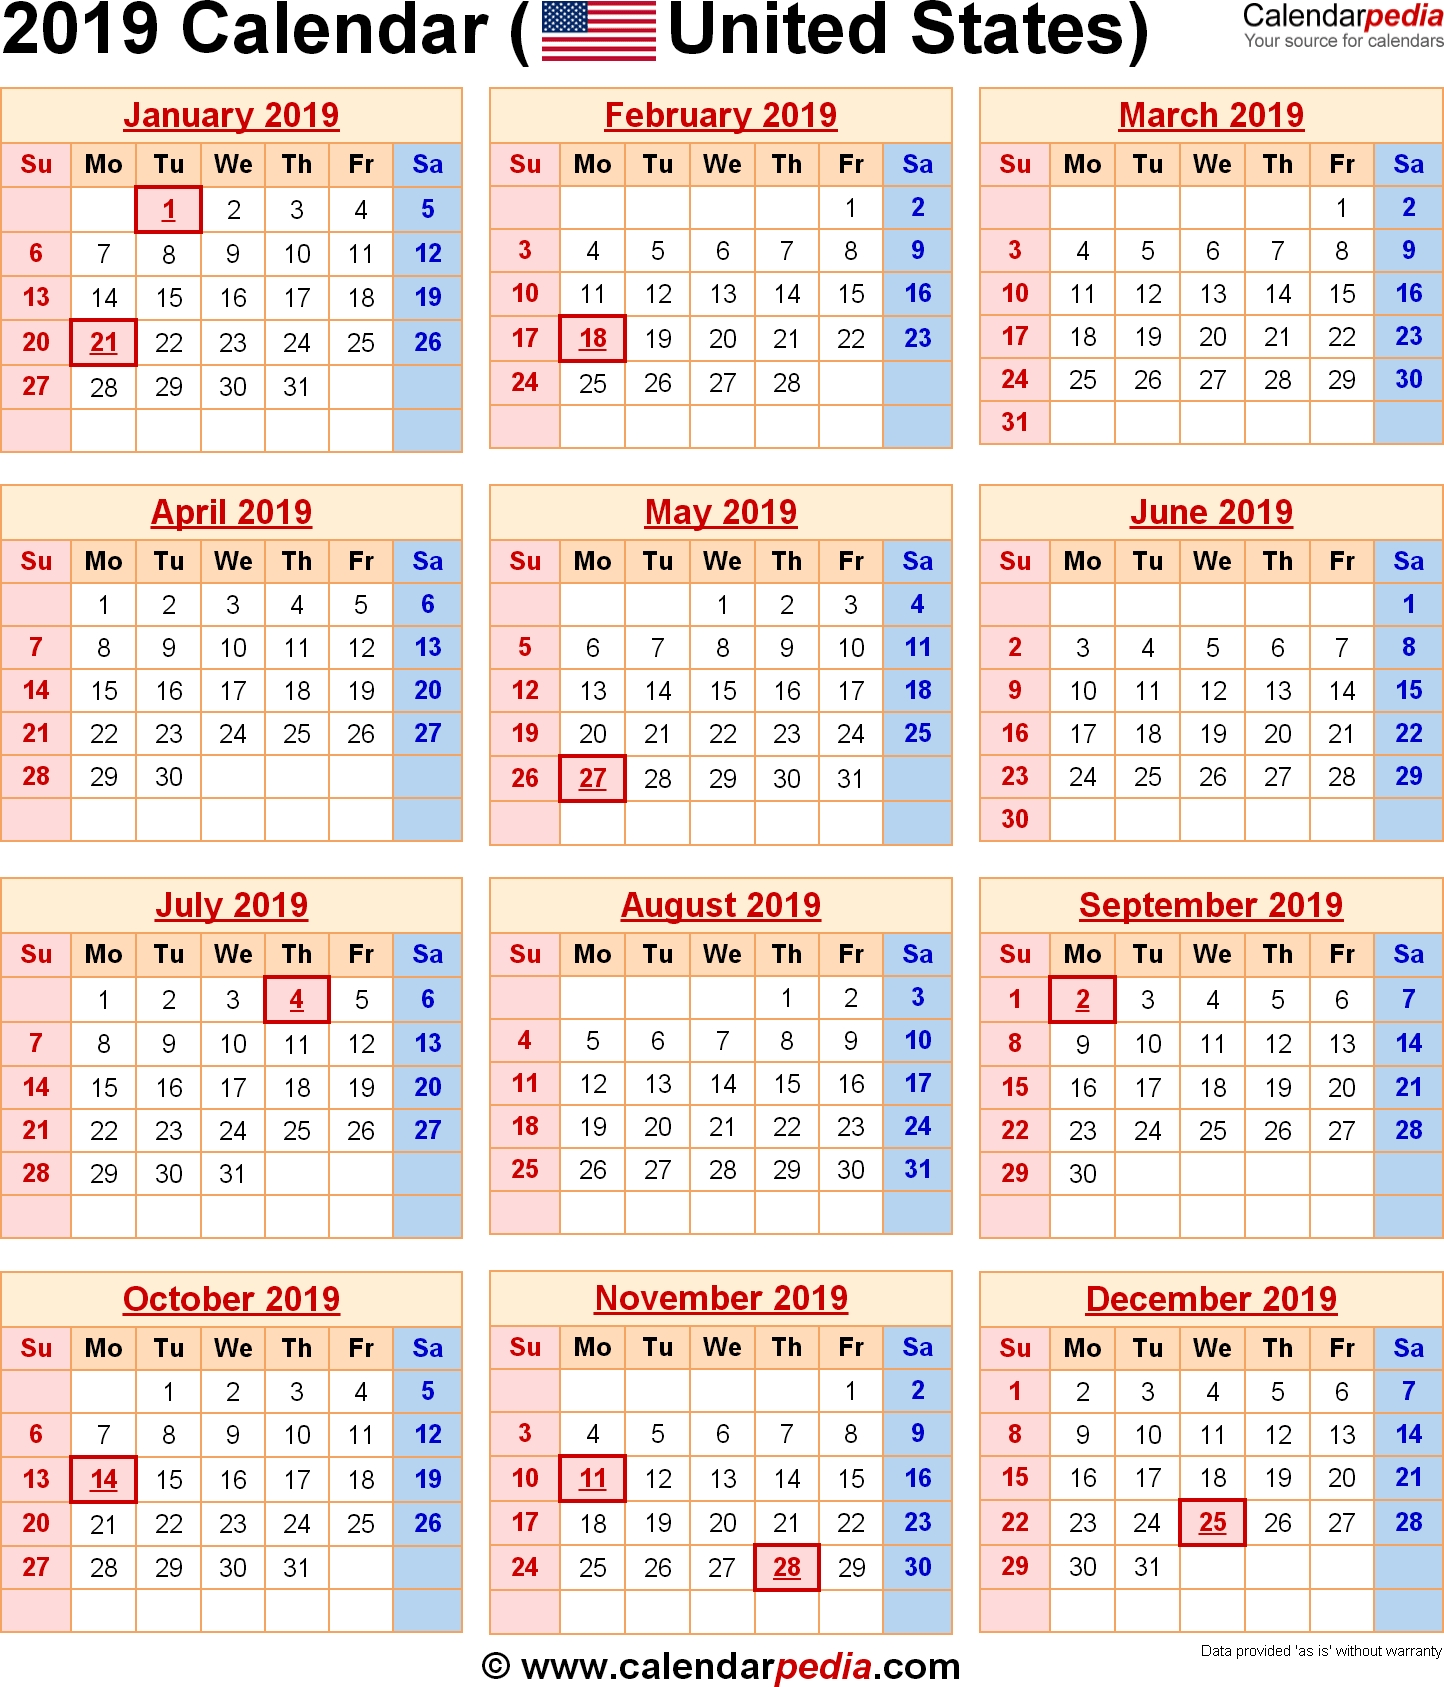 2019 Calendar United States   Us Federal Holidays   2019 Calendar Us 445 Calendar 2019